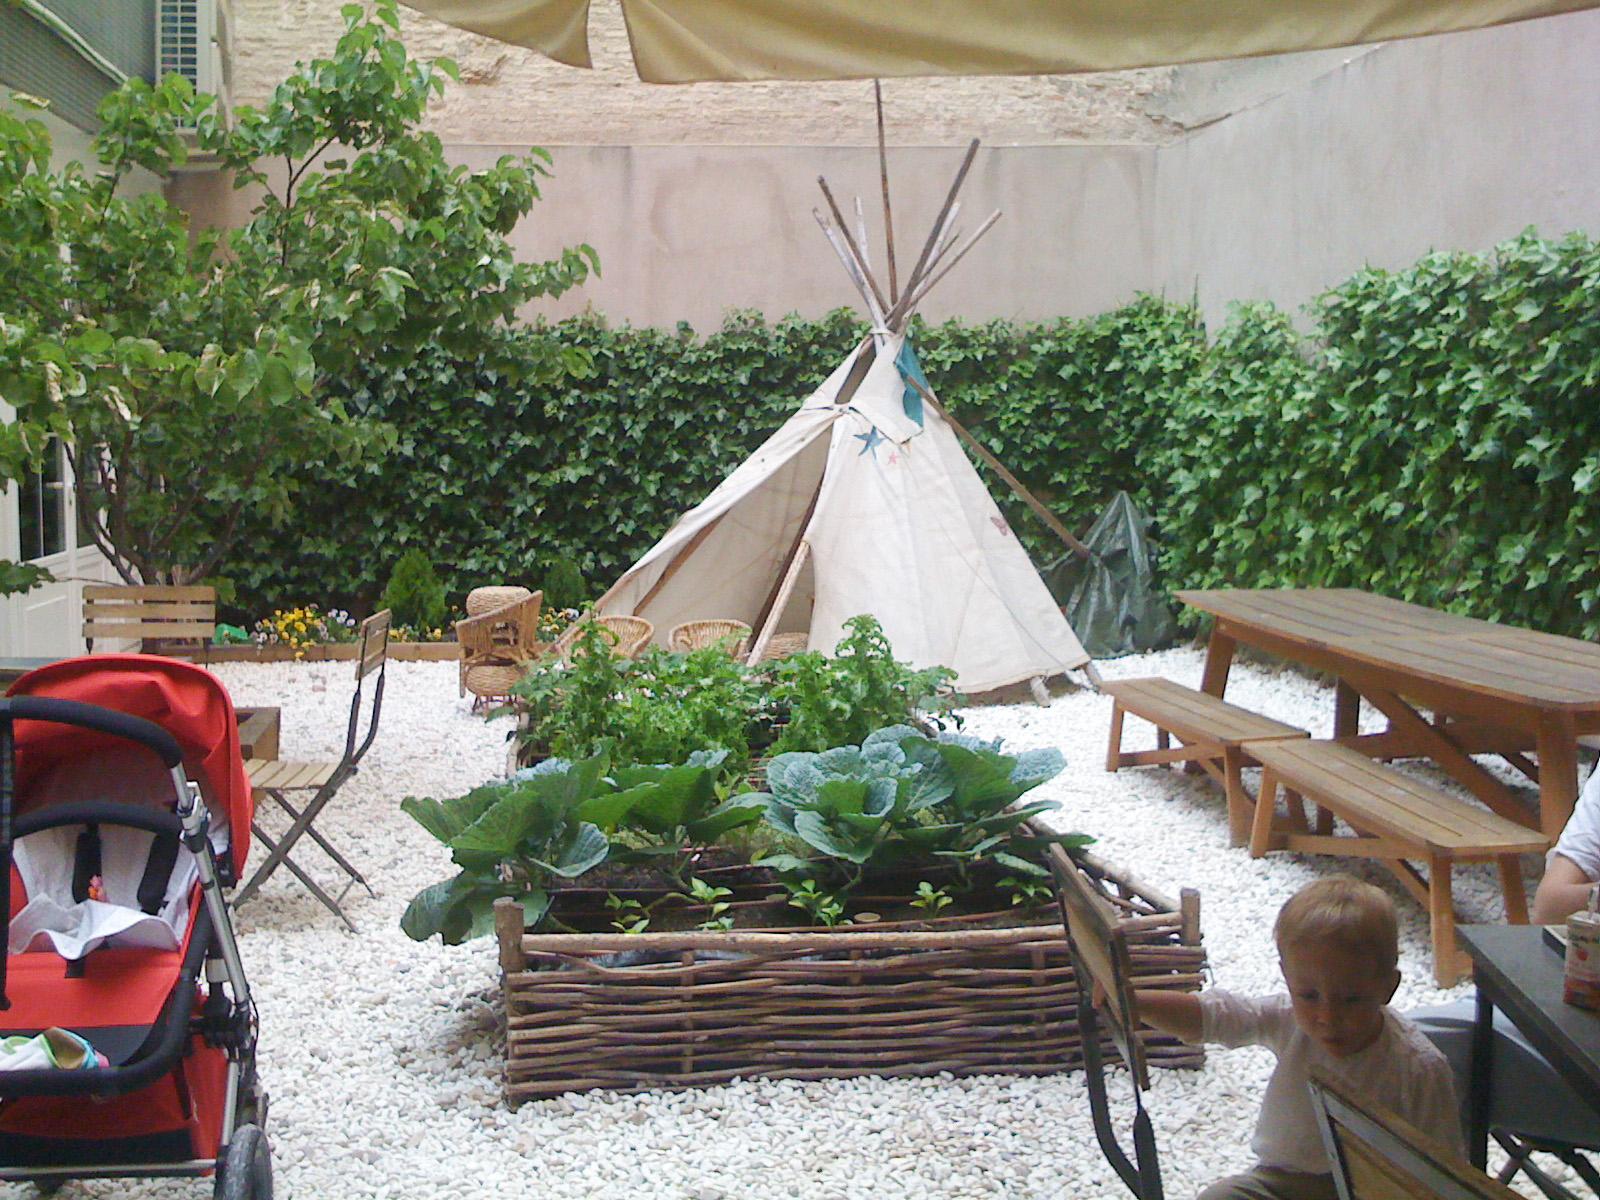 Baby deli nataliagustafsonblog for Piedras para patio